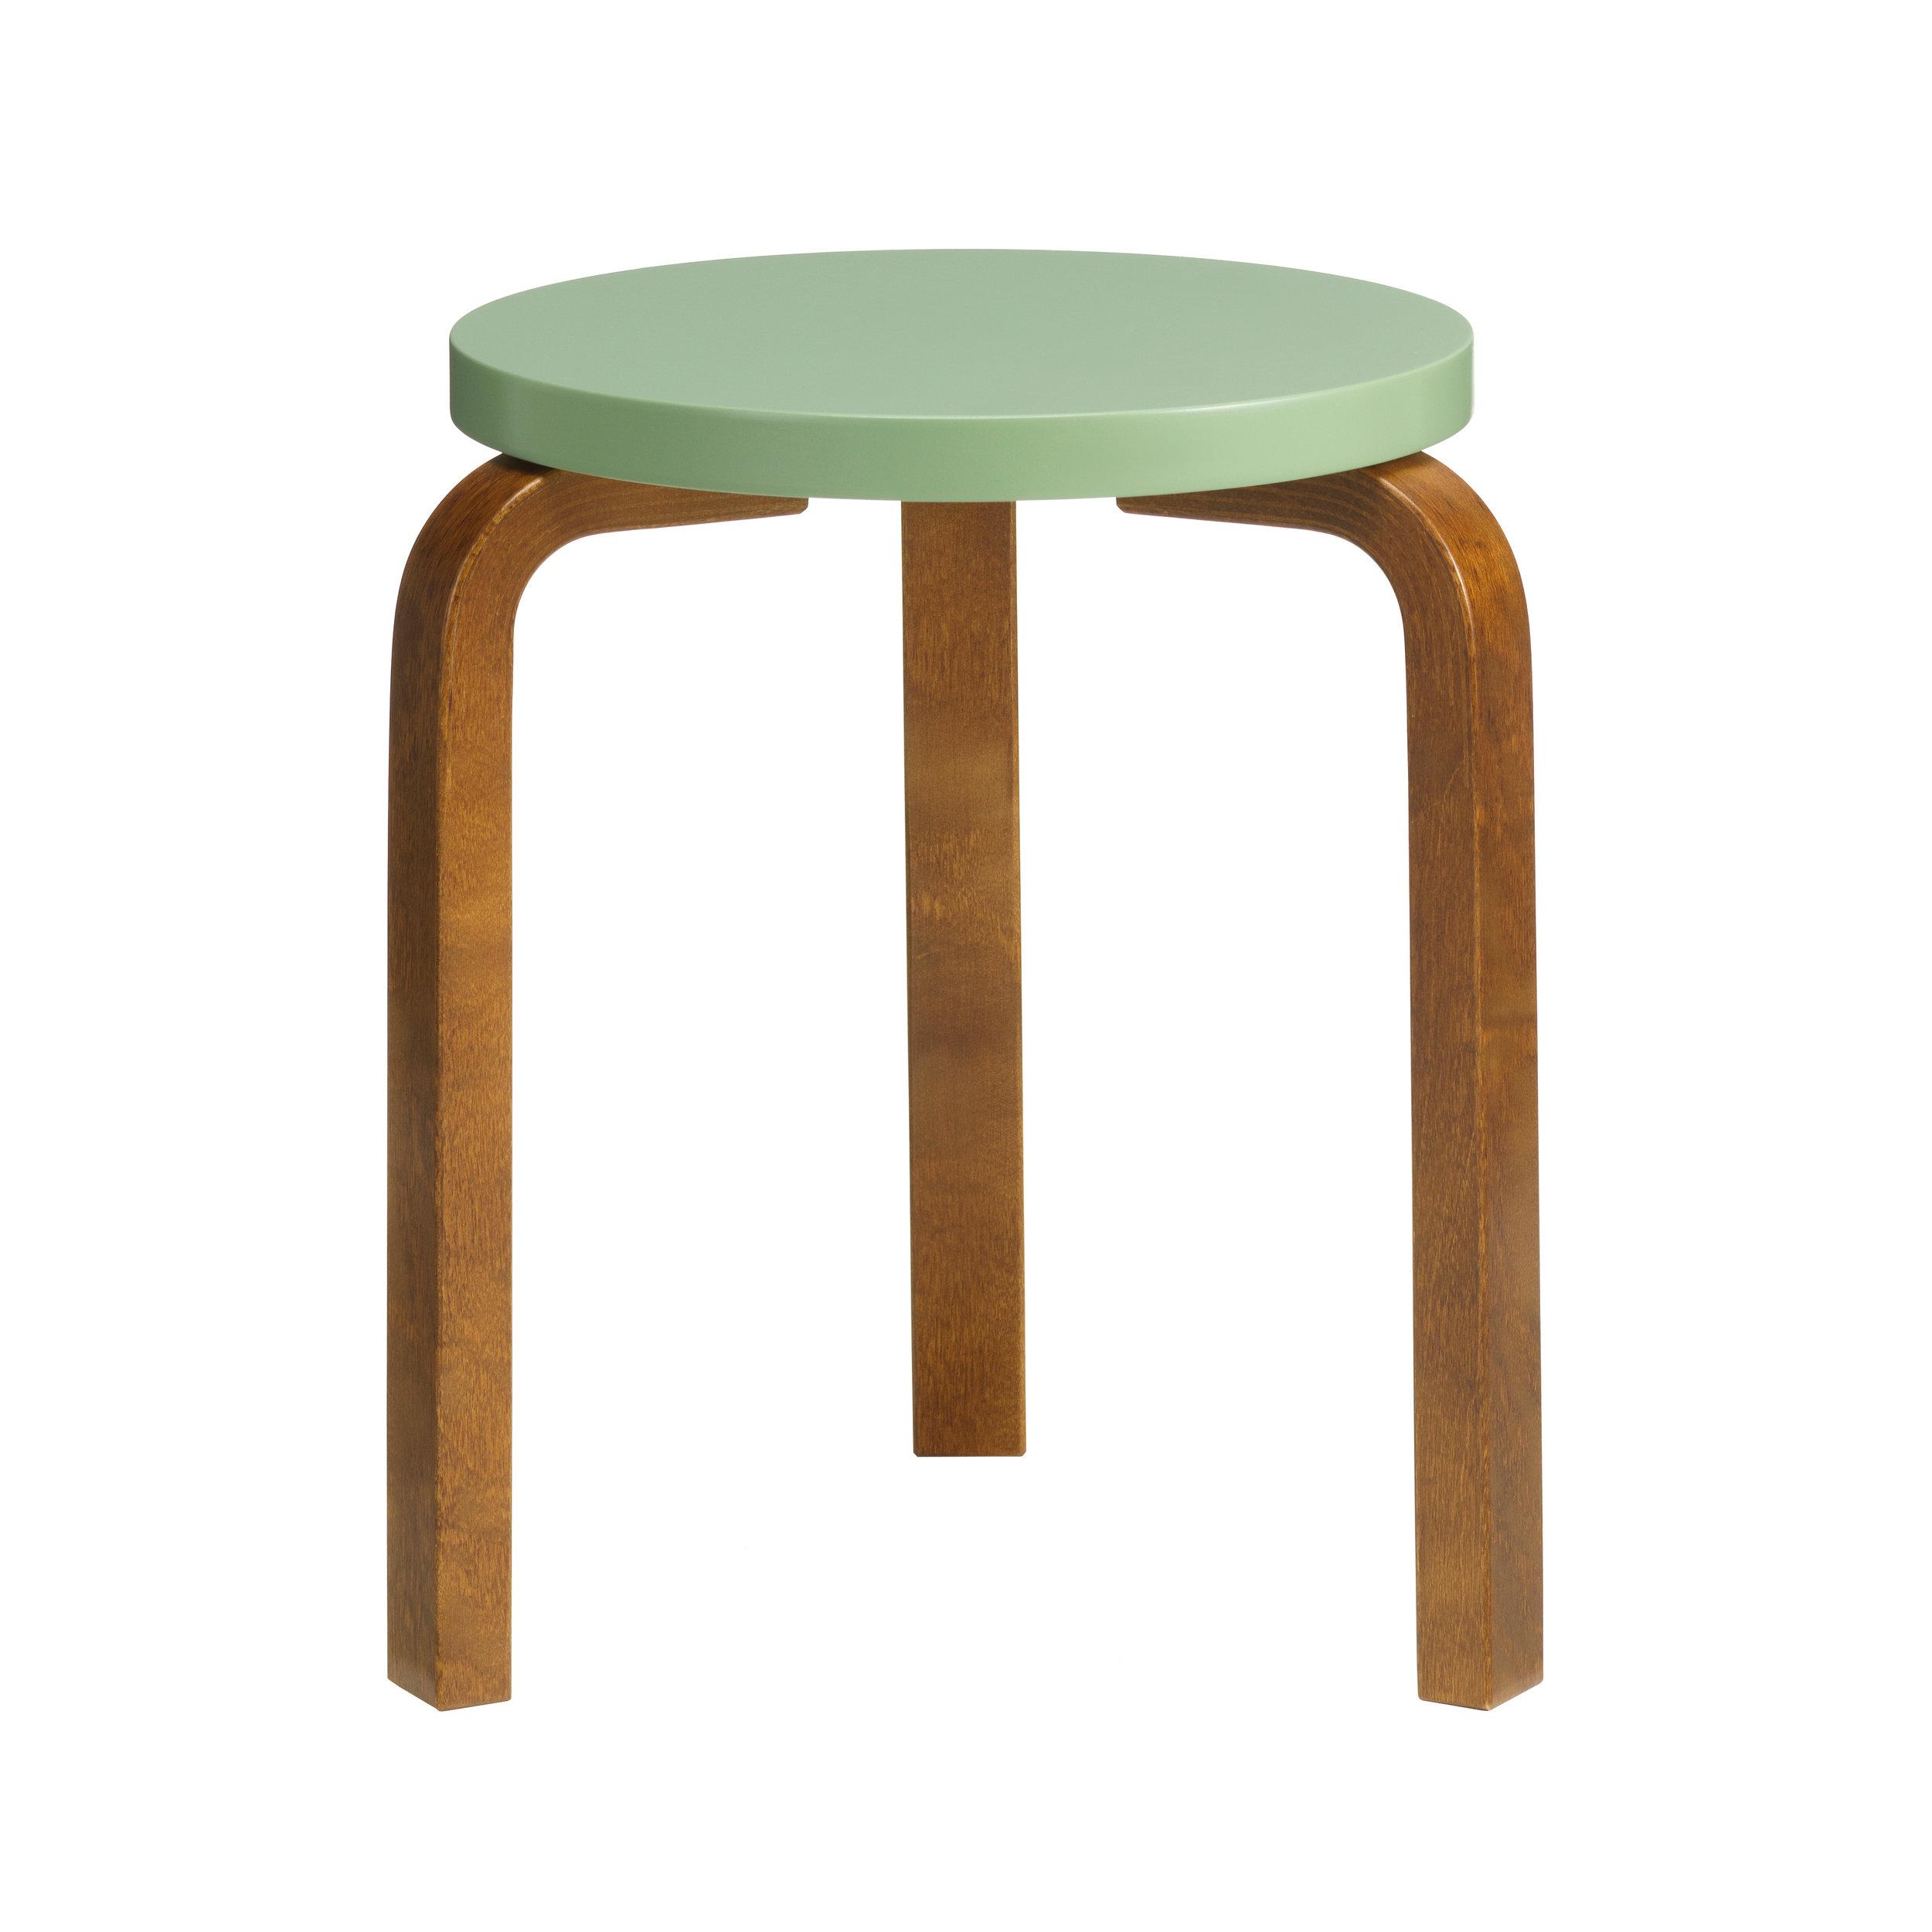 Stool 60 Legs: birch, walnut stain Seat: birch, pale green lacquer